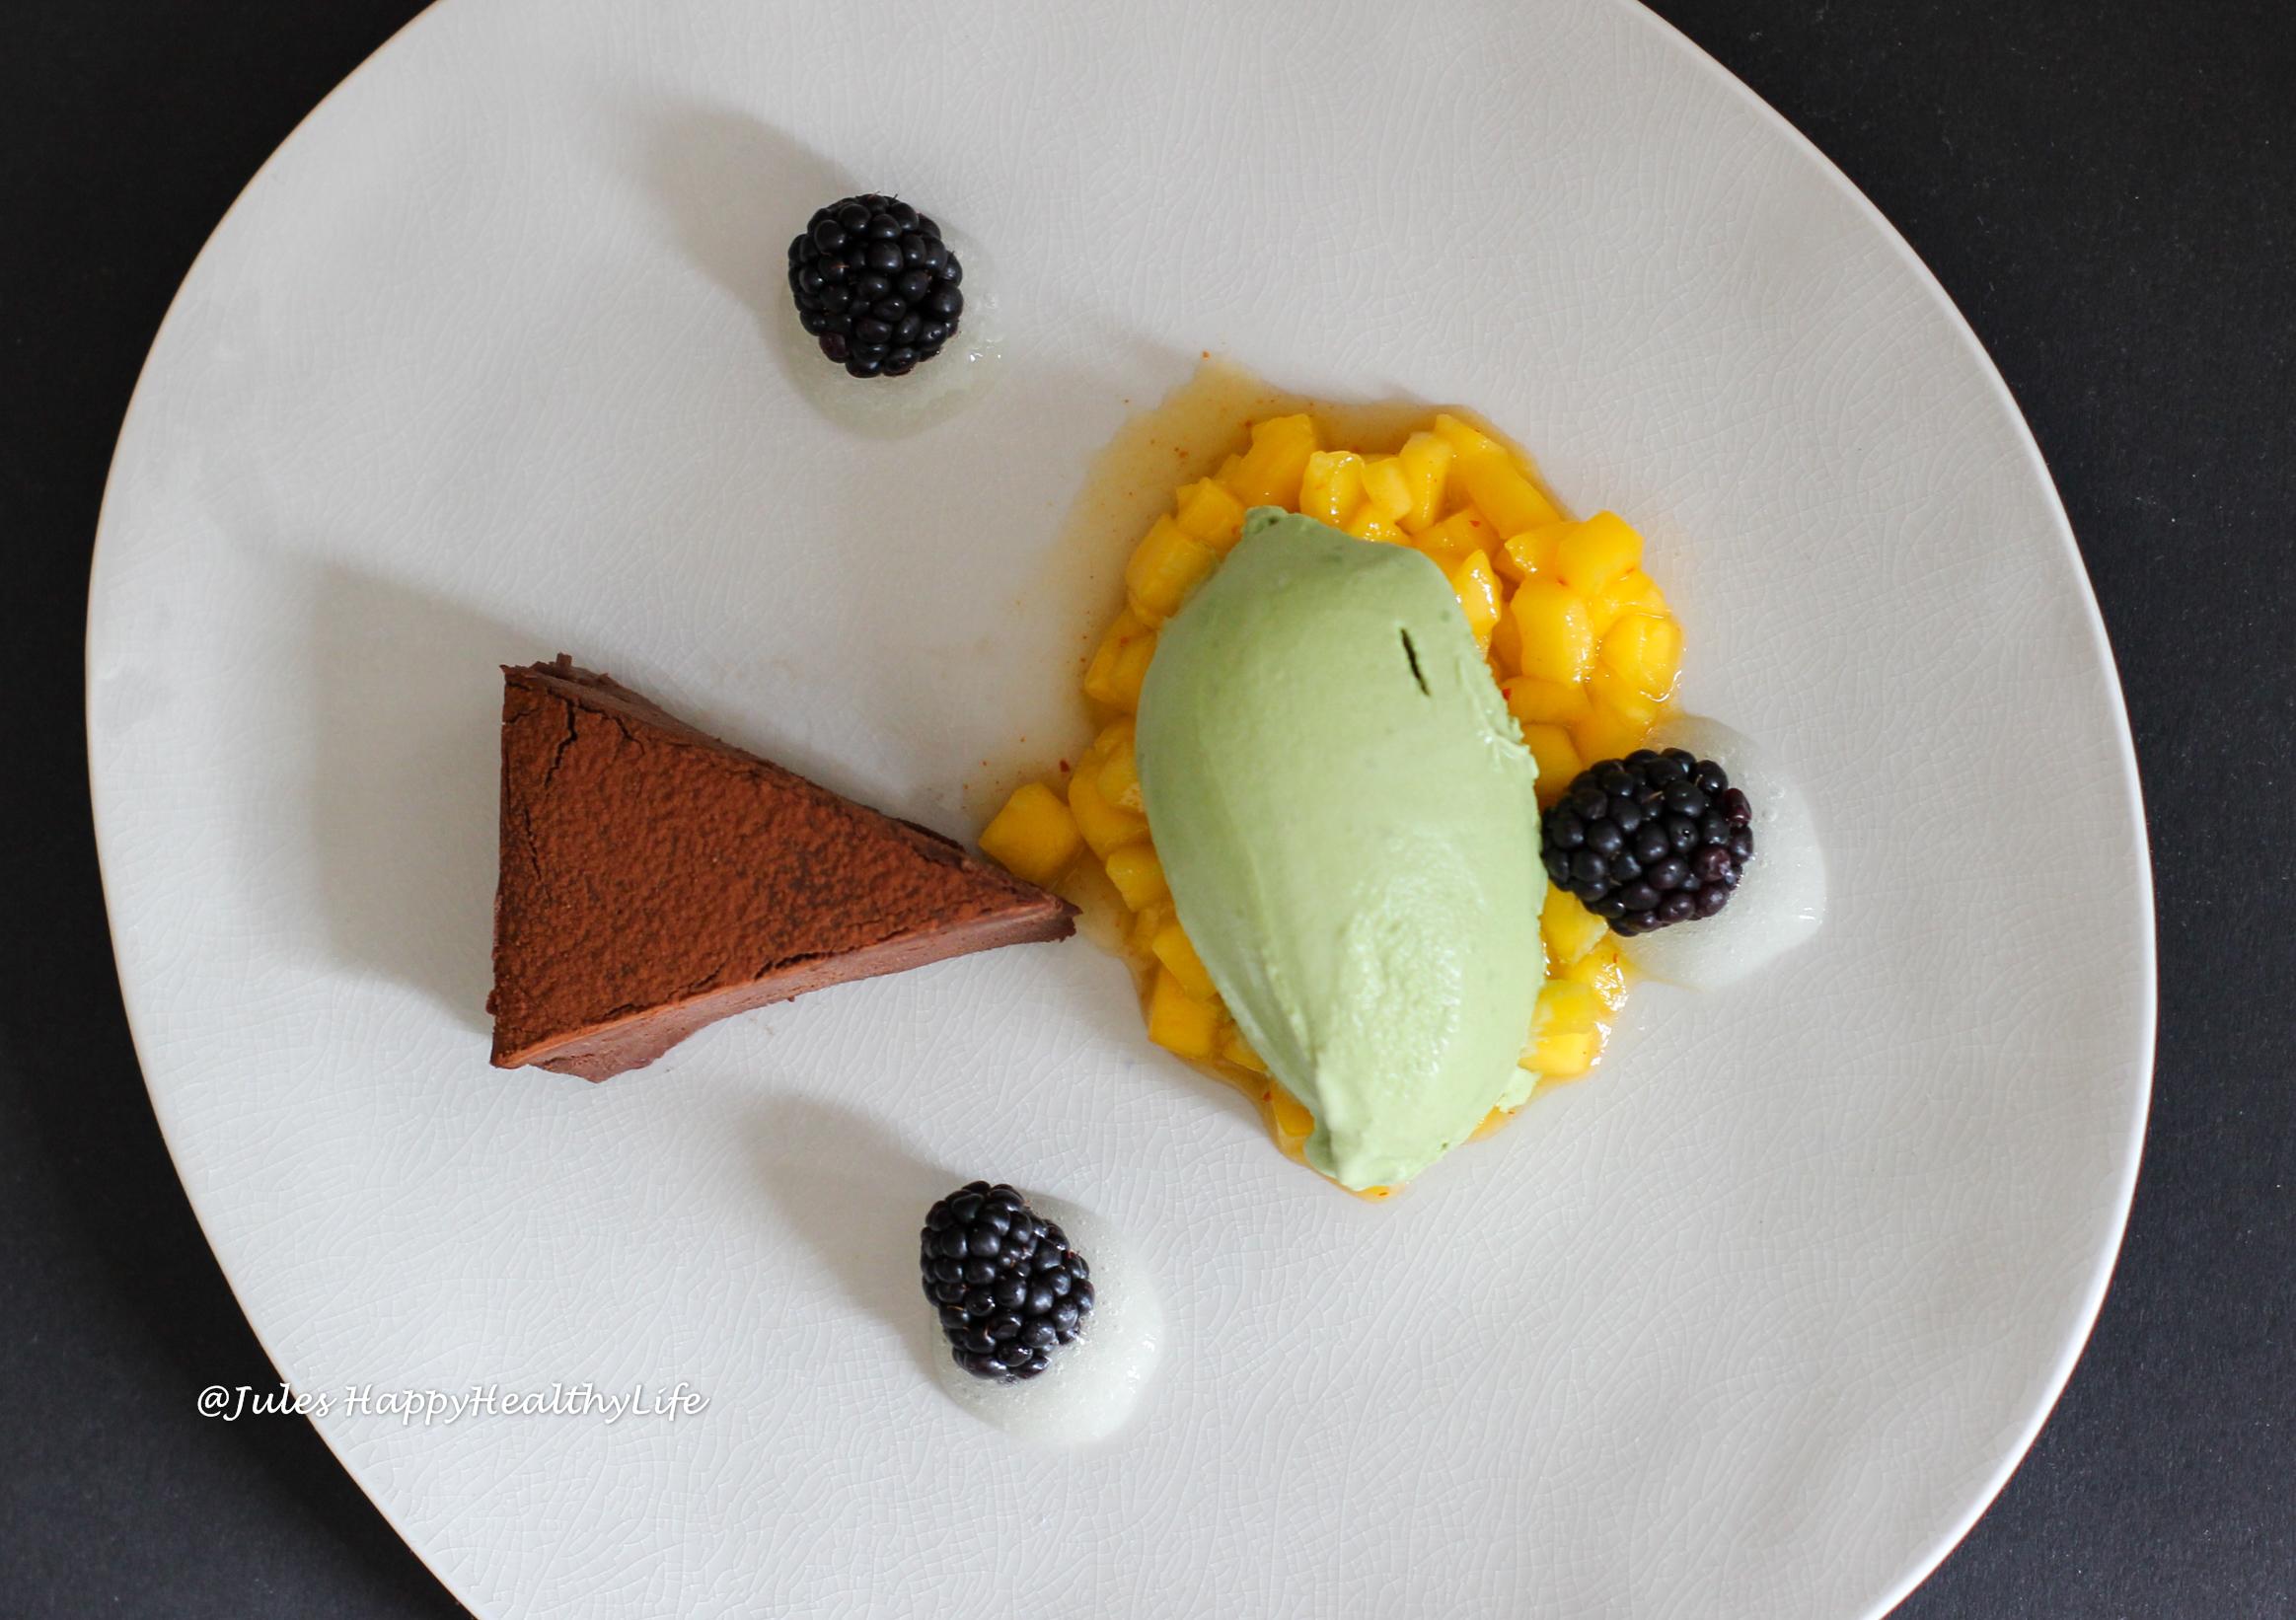 Mangokompott mit Chili, Zitronengel, Matcha Eis und Schoko Ganache Tarte